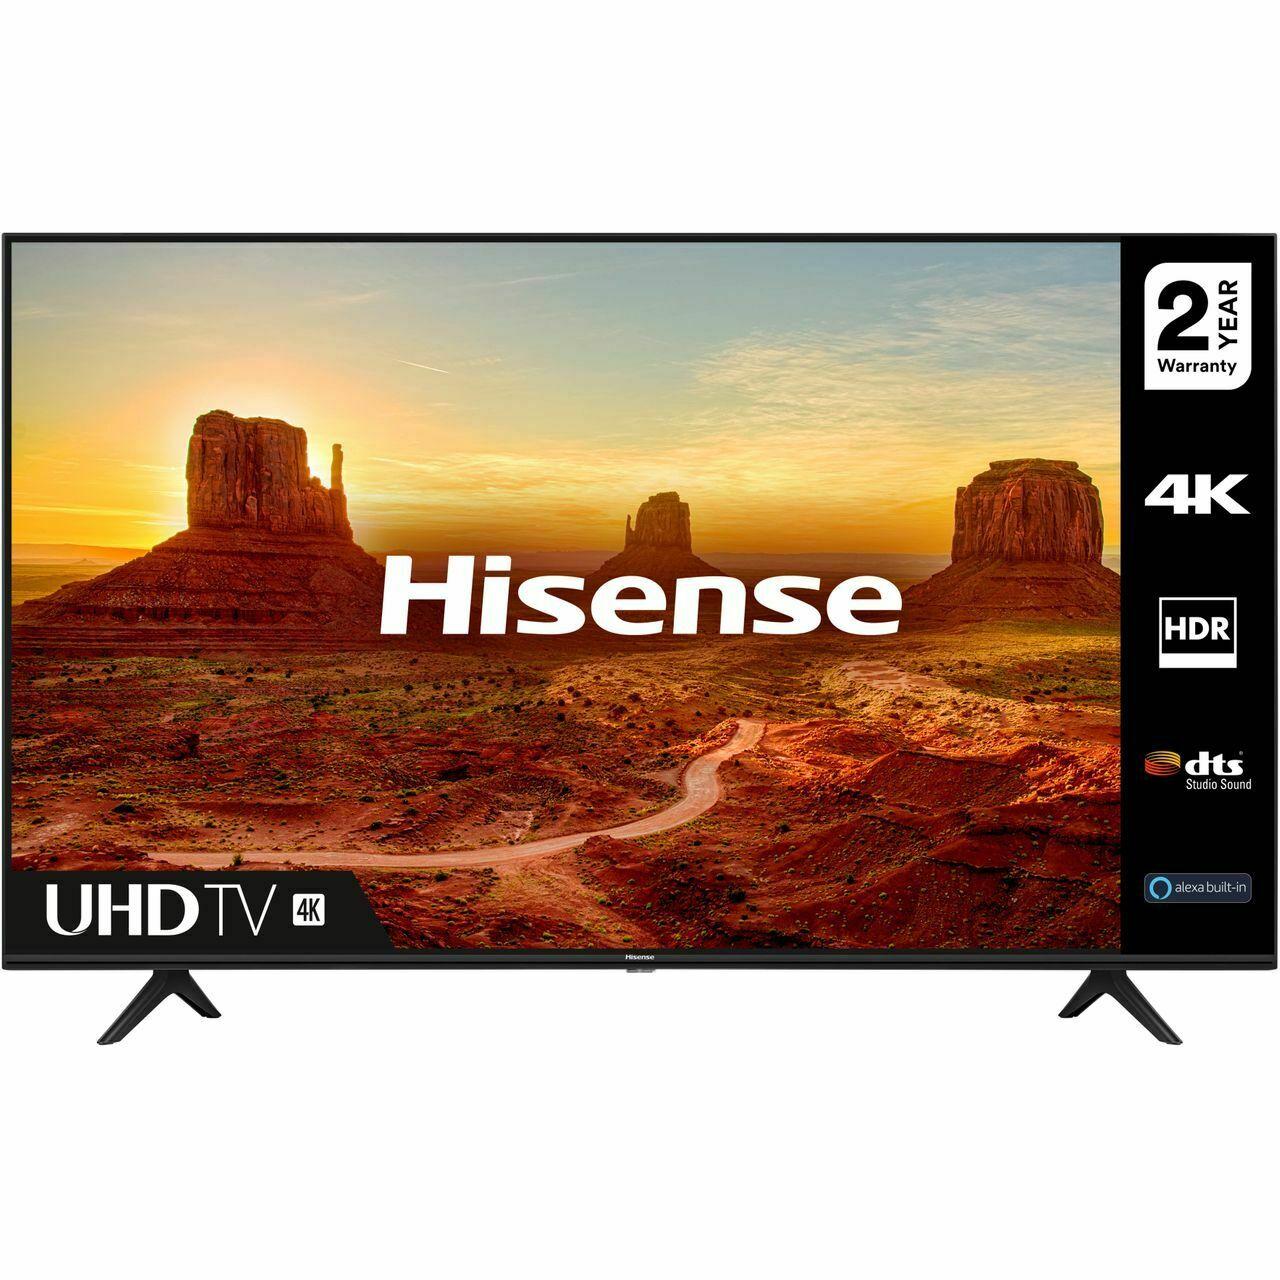 Hisense 50A7100FTUK 50 Inch TV Smart 4K Ultra HD - £319 delivered using code @ AO / eBay